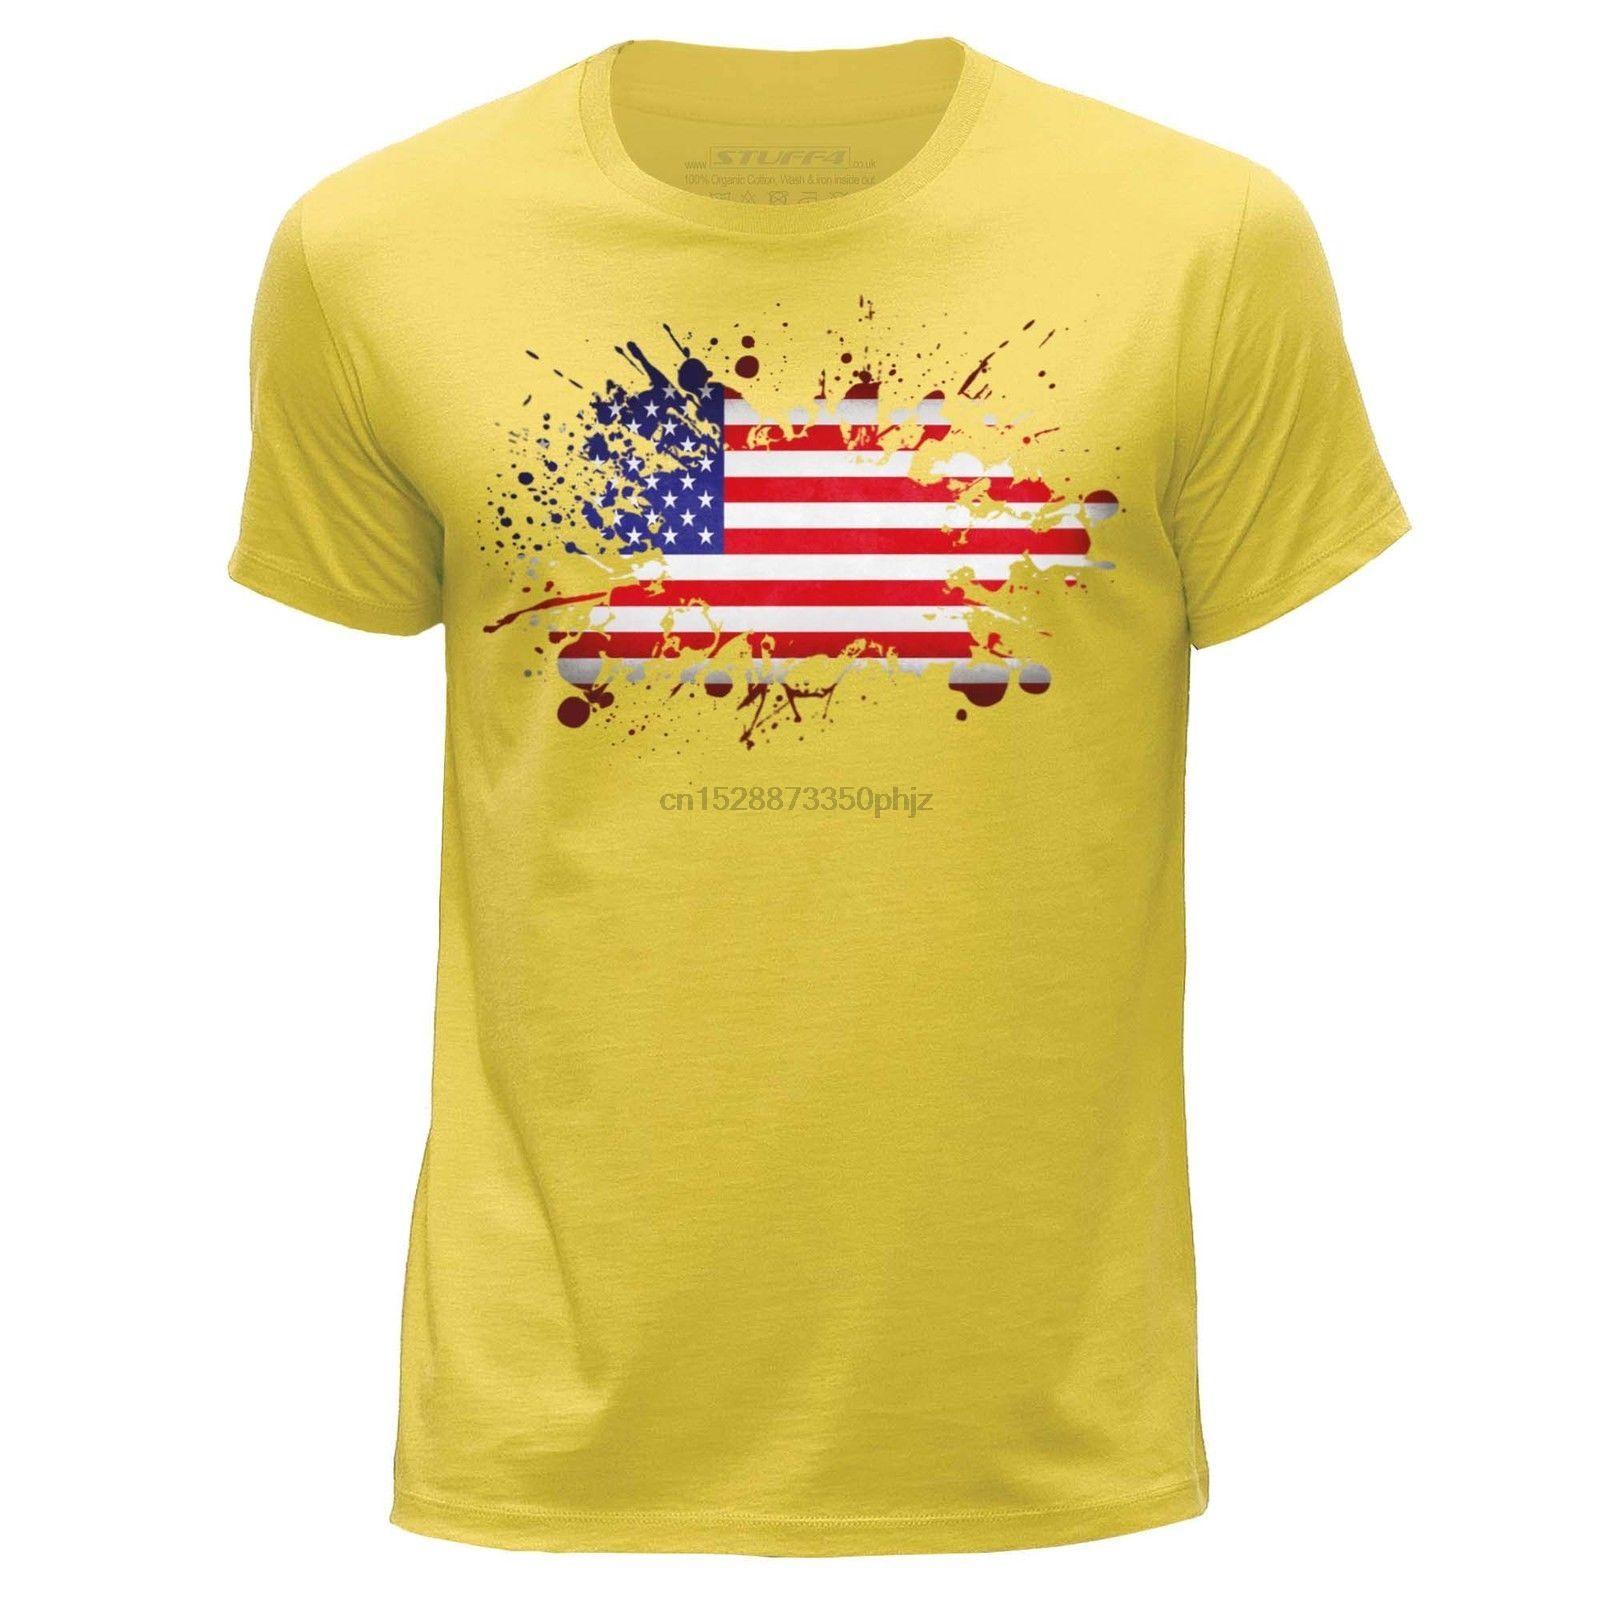 Stuff4 Herren Gelb Rundhals T-Shirt Usa American Flagge Sz Cool Casual Pride T Shirt Men Unisex New Tshirt Loose Fashion